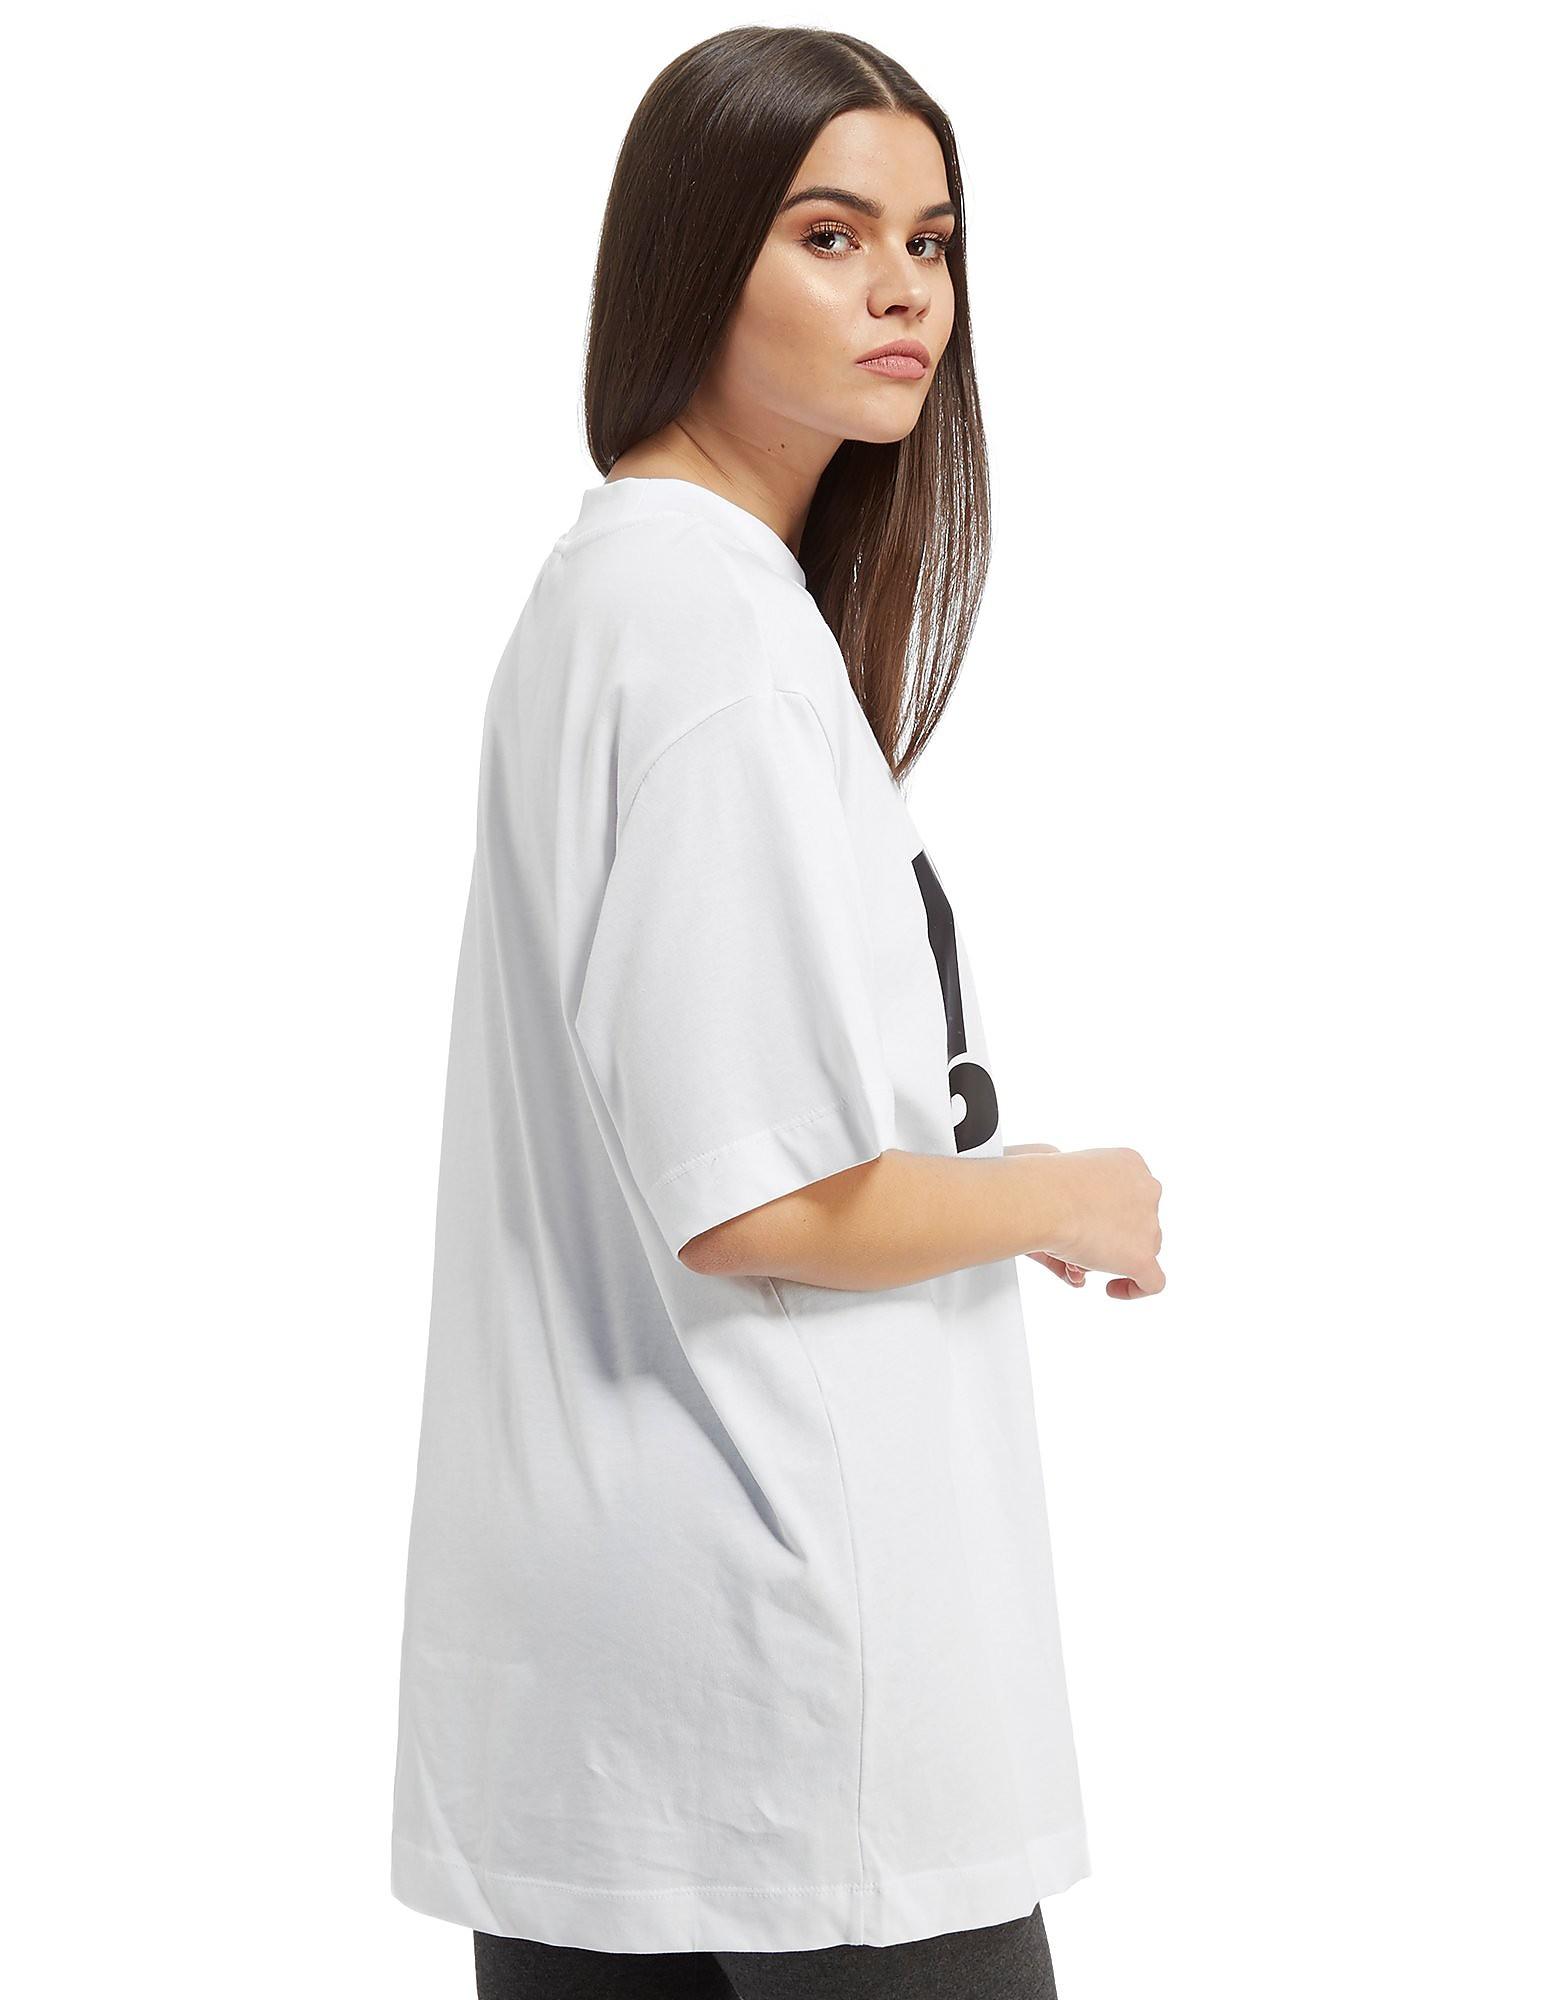 IVY PARK Logo Boyfriend T-Shirt Femme